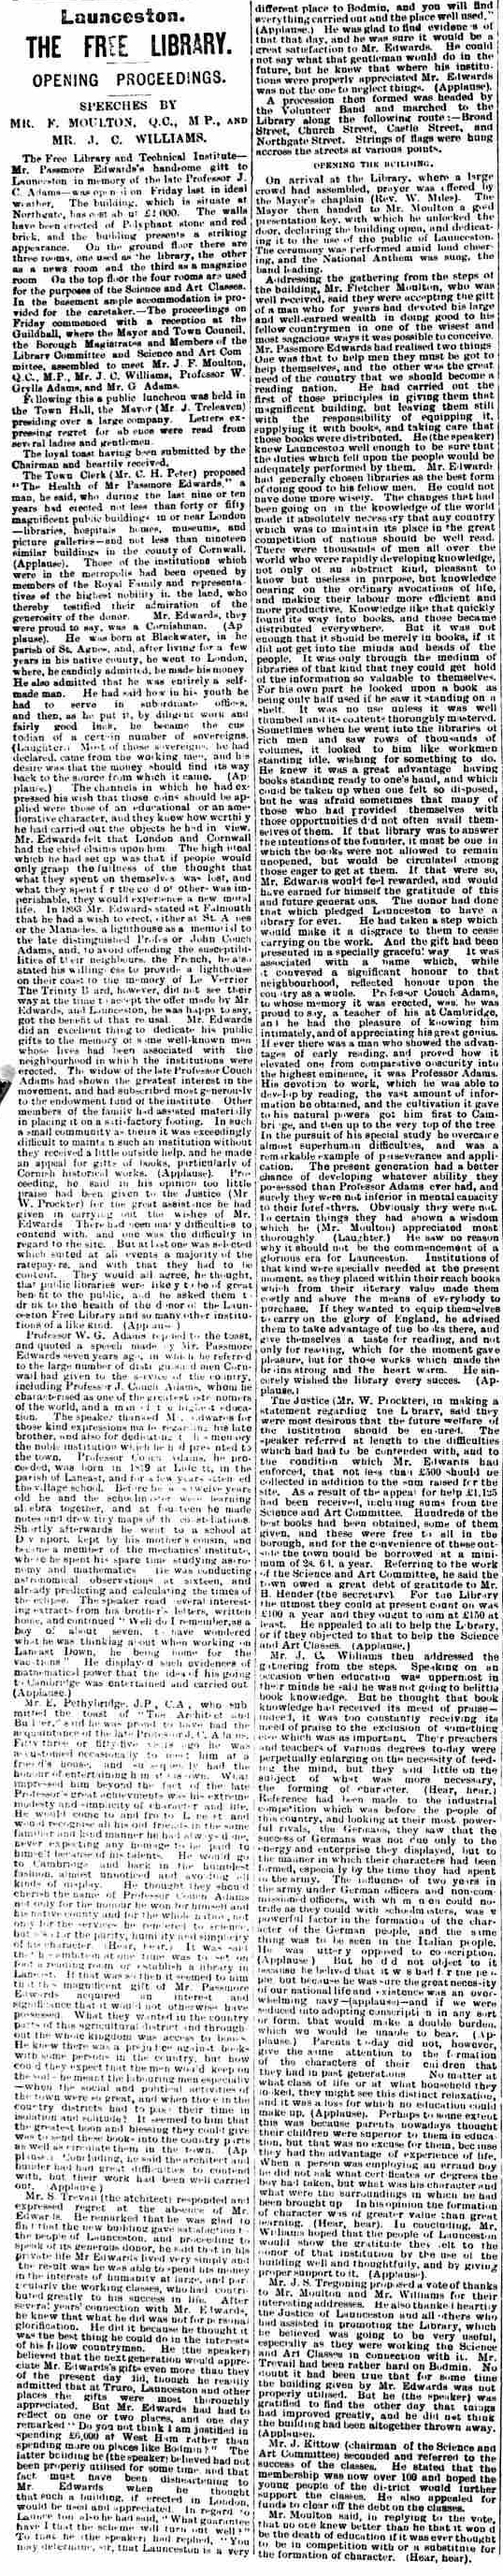 28 April 1900